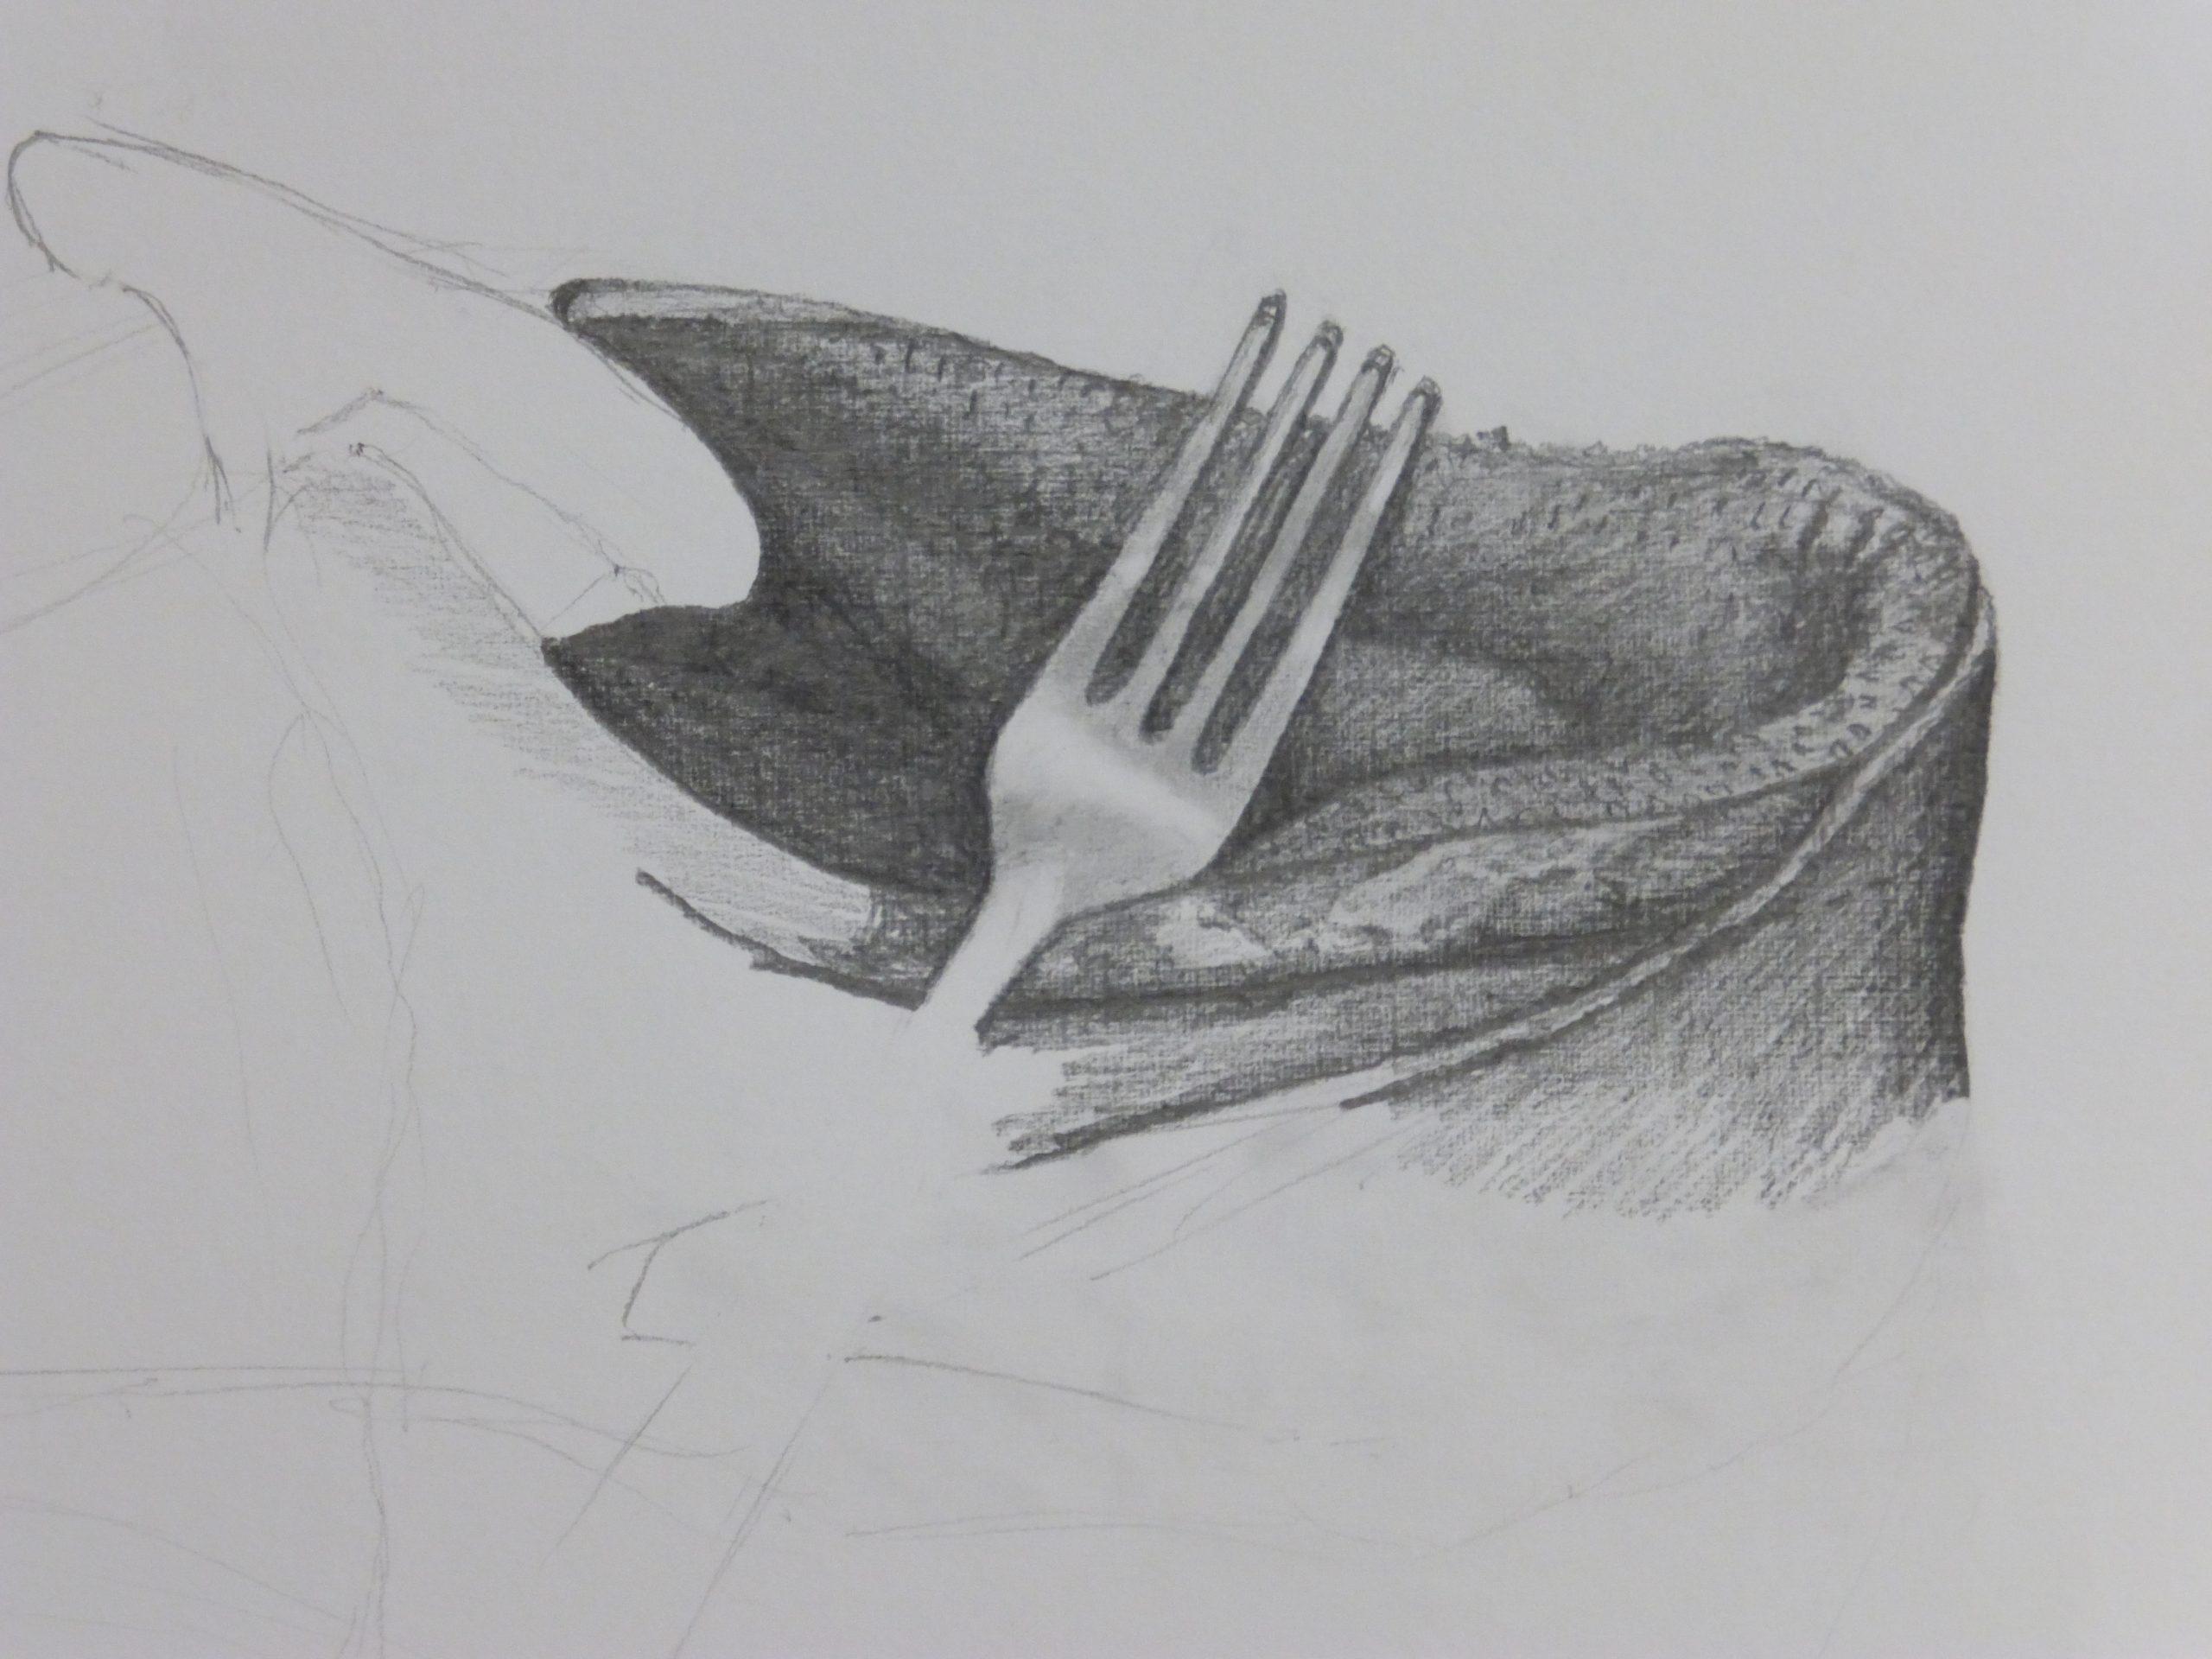 Precise Accurate erasing Art Sketching KOH-I-NOOR ERASER RUBBER PENCIL